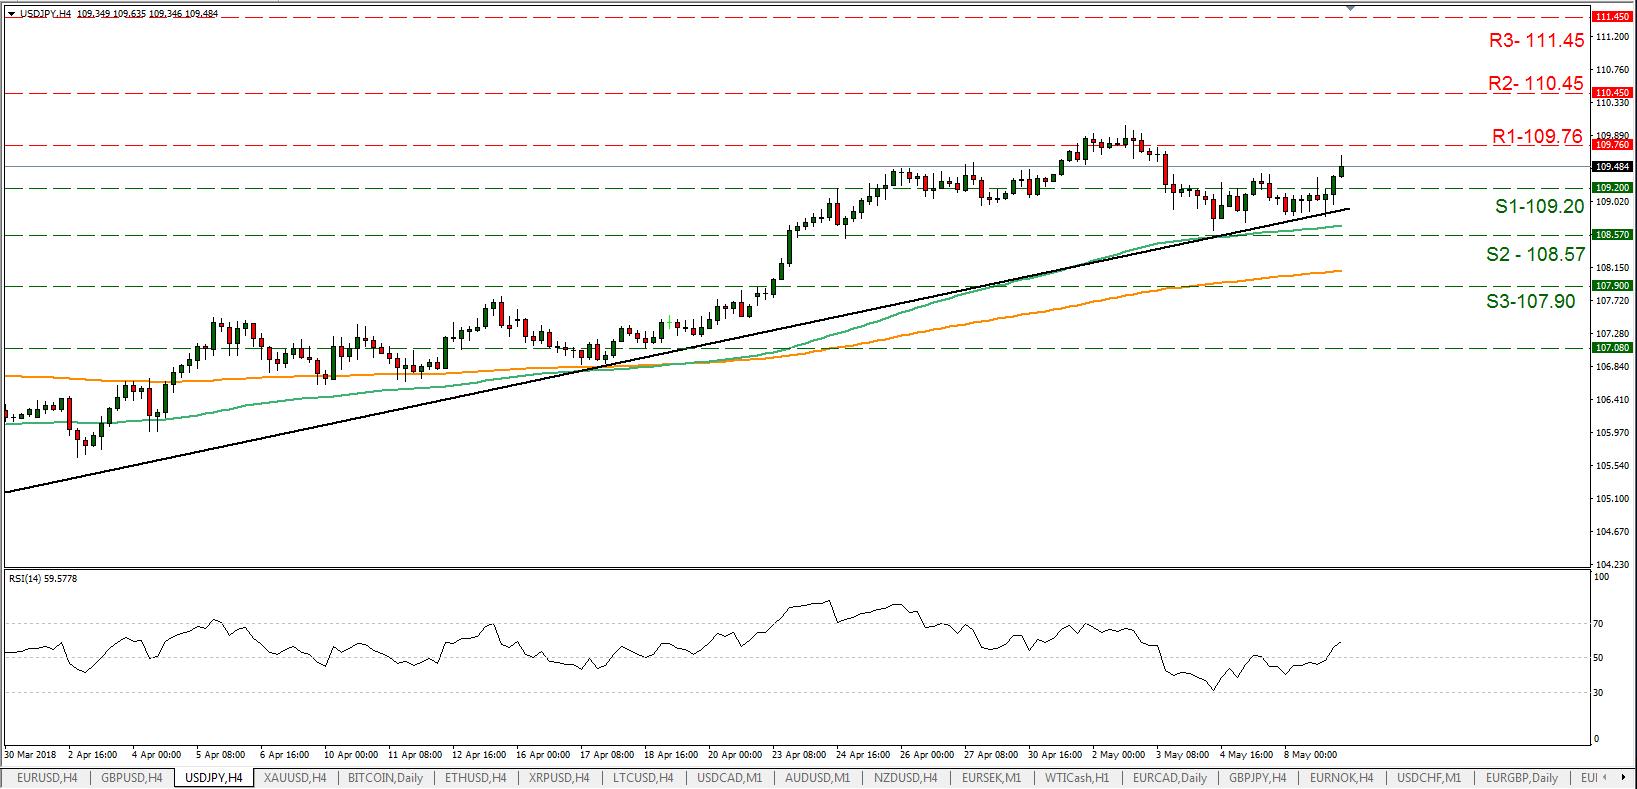 USD/JPY 09/05/2018 | EconAlerts